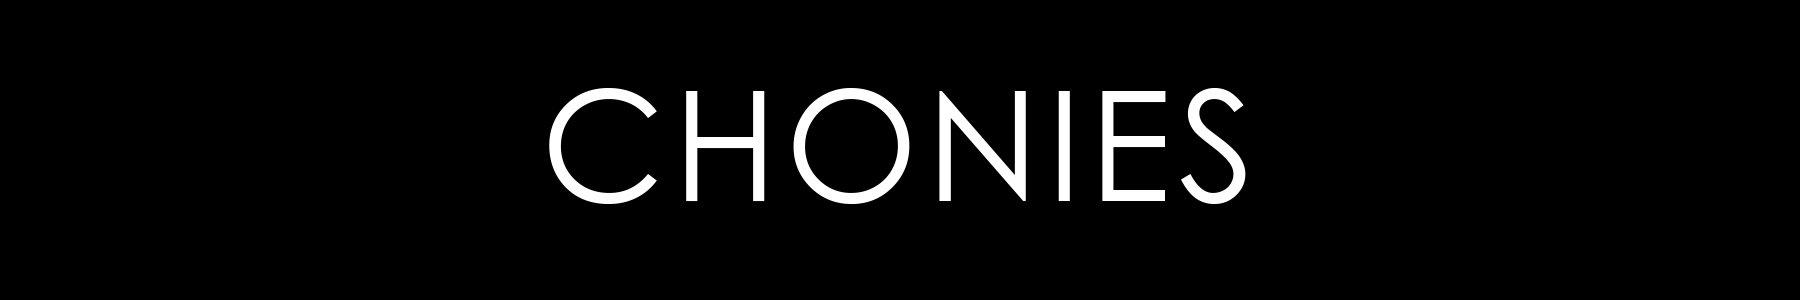 Chonies Brand